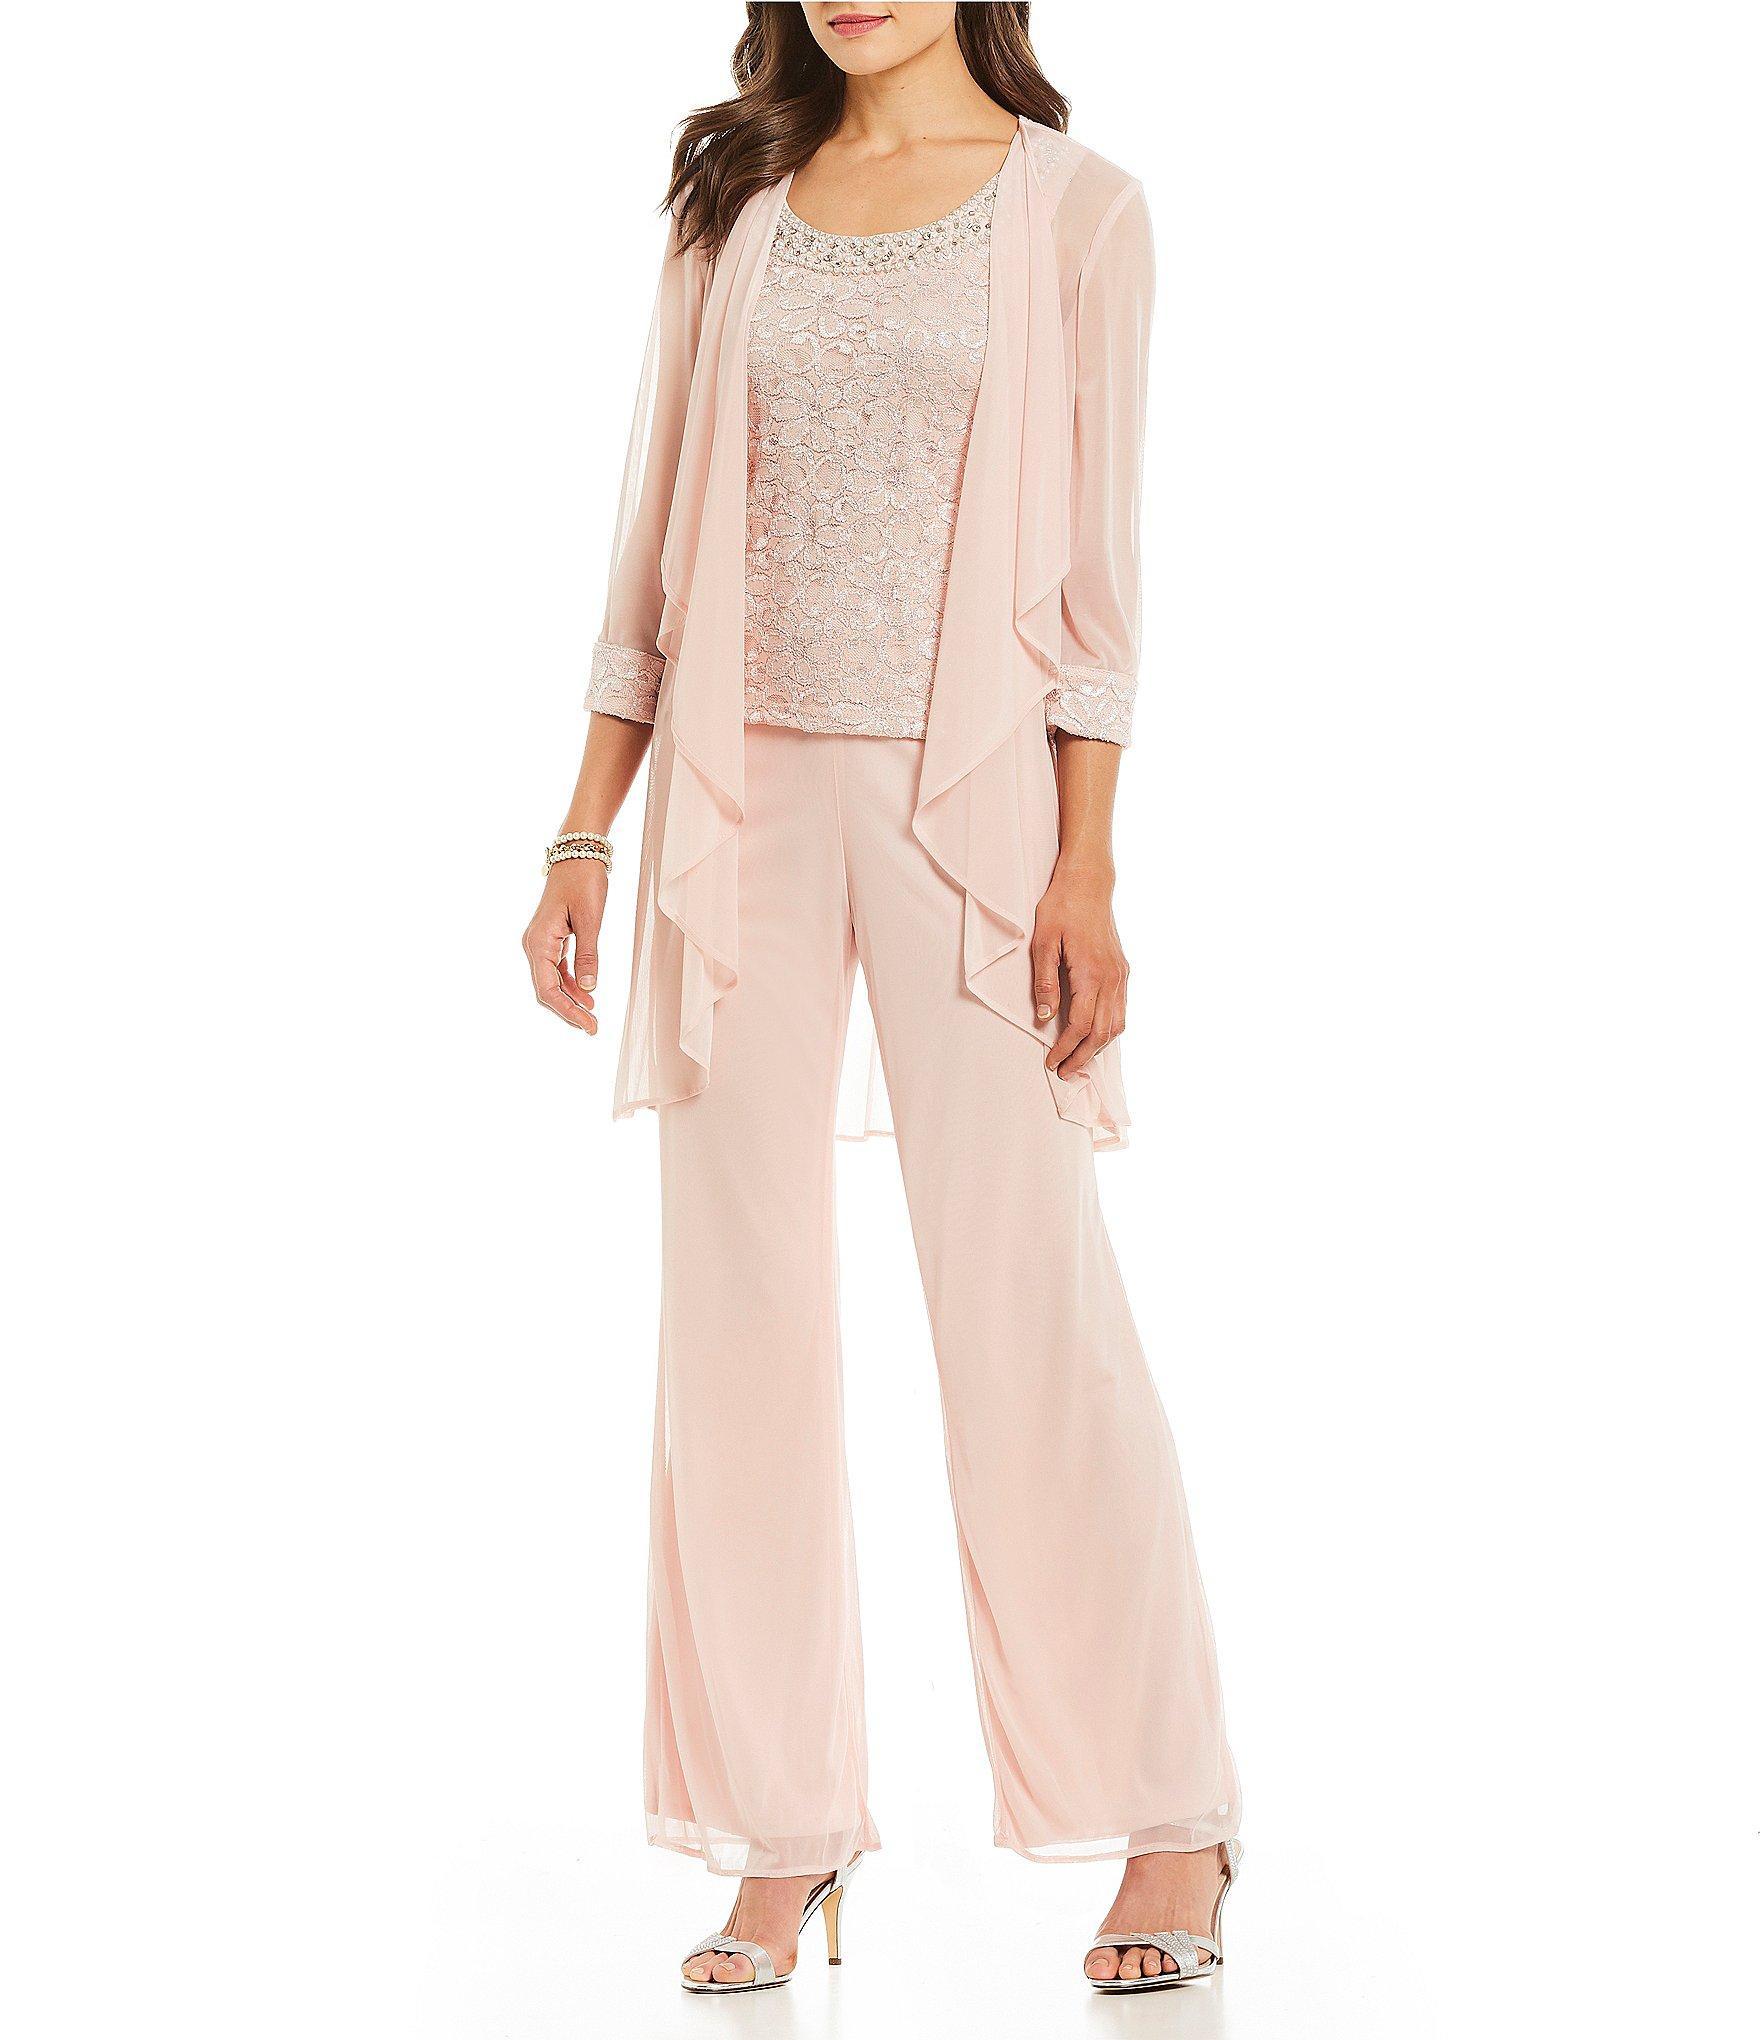 2038b123ac49 R & M Richards 3-piece Glitter Lace Flyaway Pant Set in Pink - Lyst